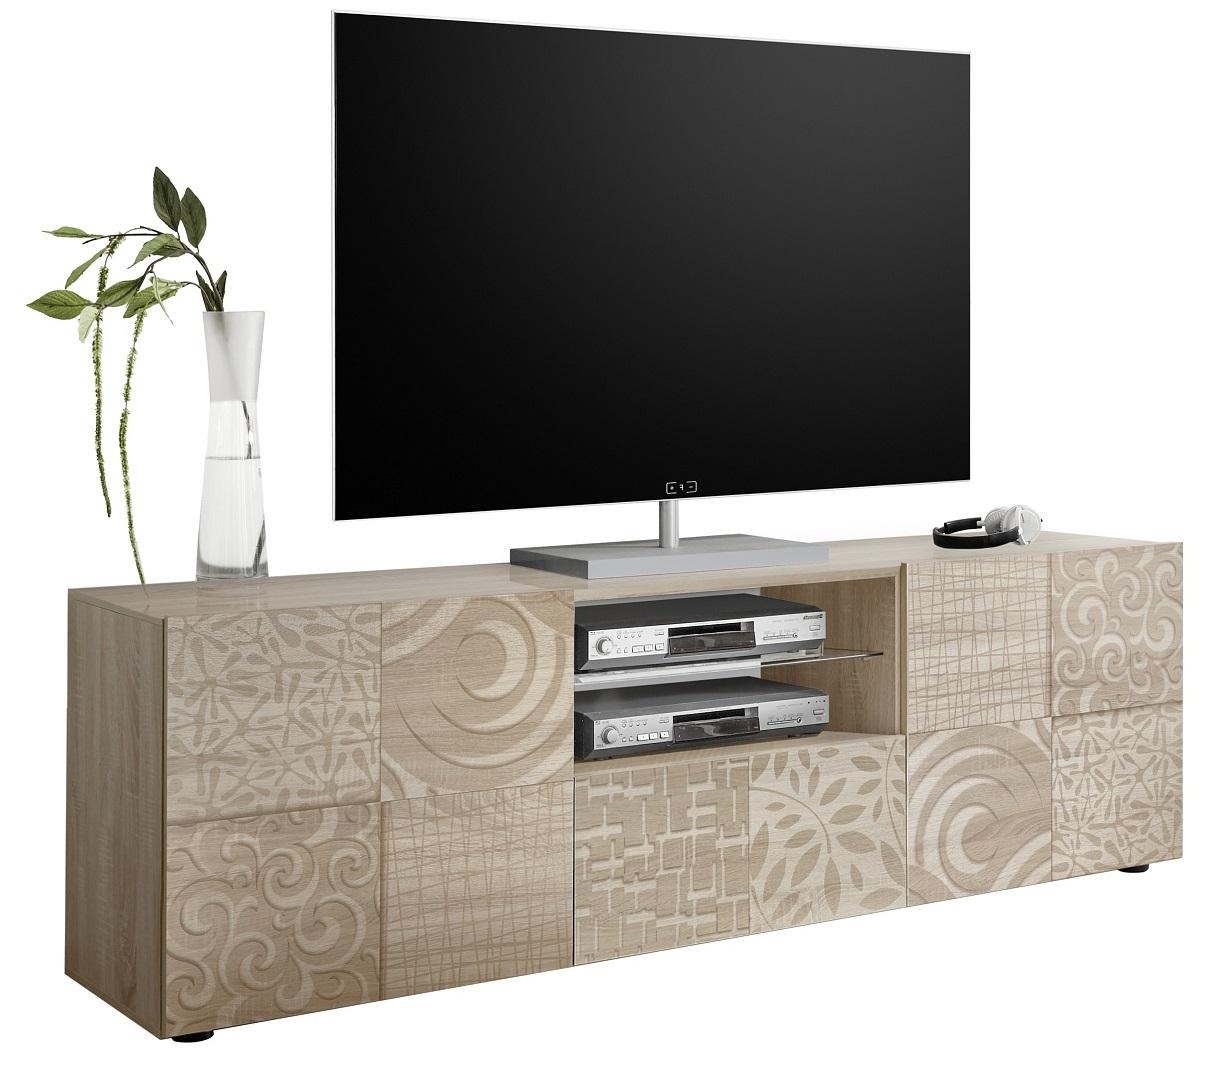 Tv-meubel Miro 181 cm breed in sonoma eiken